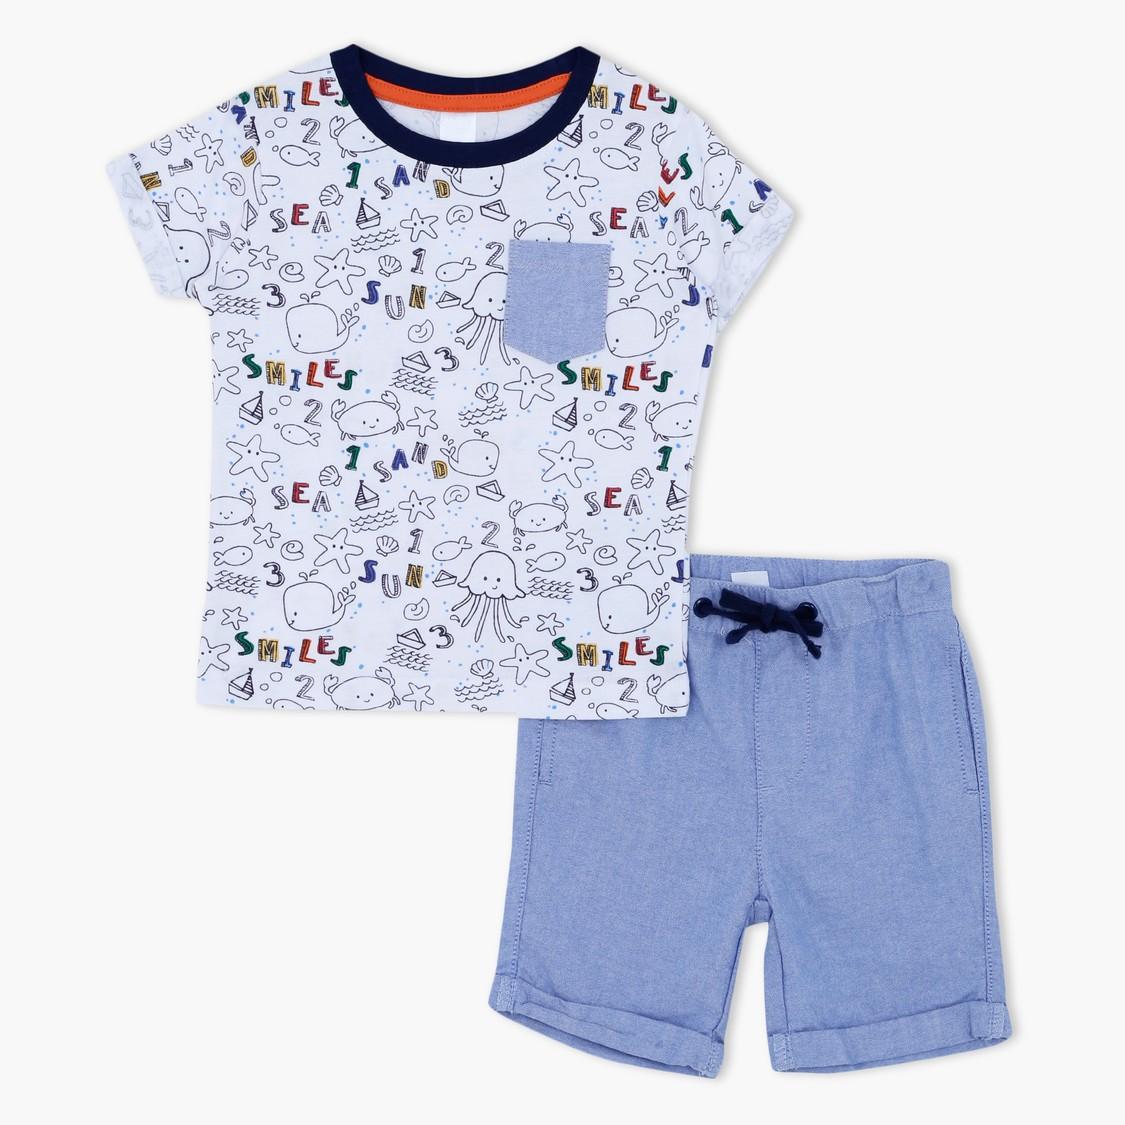 Graphic Print T-Shirt and Shorts Set